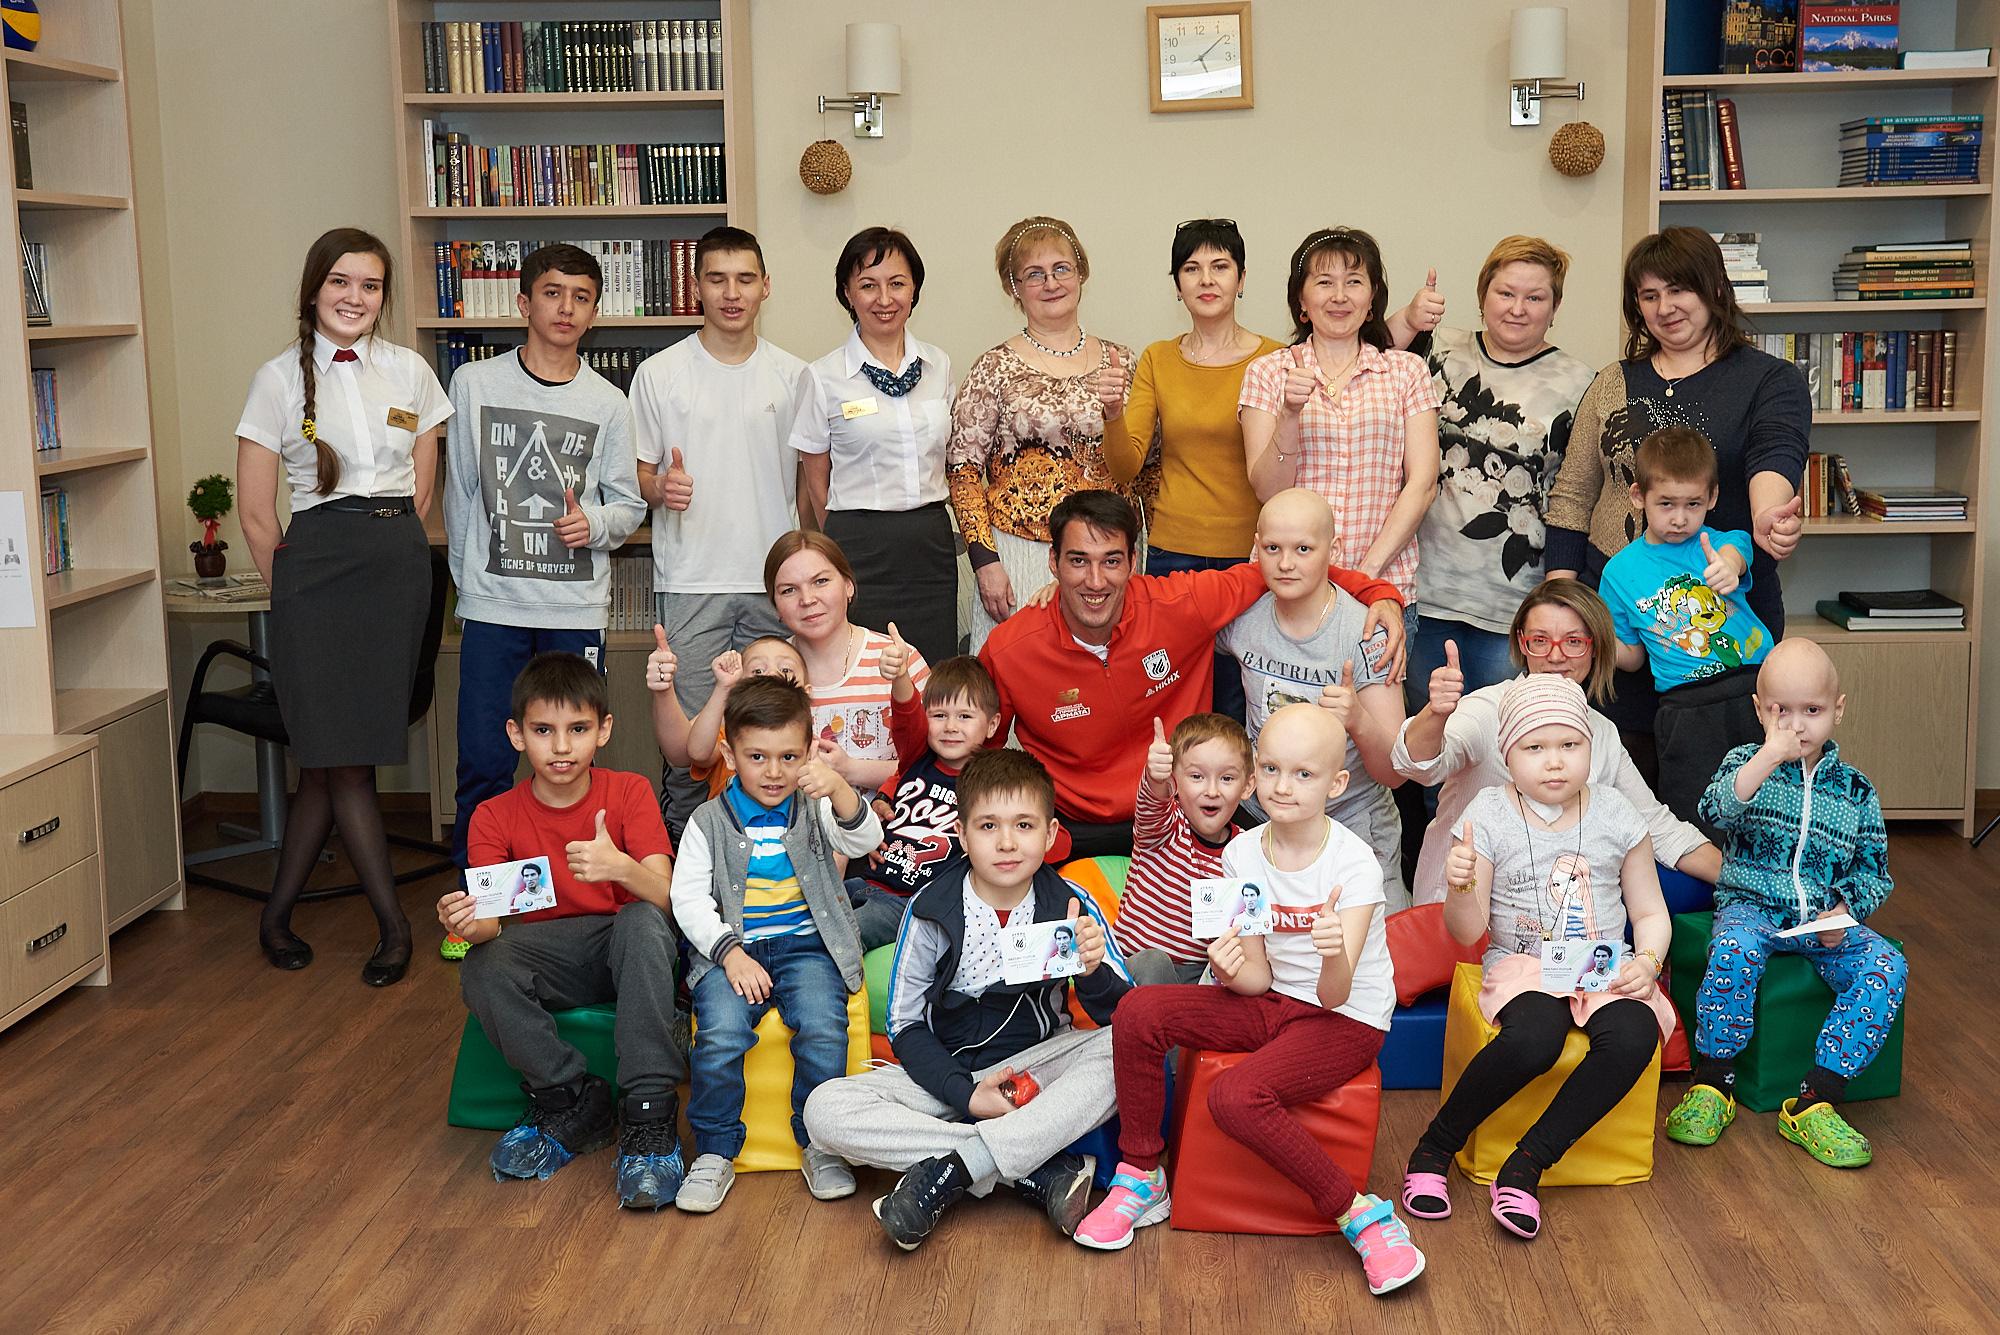 Нападающий «Рубина» Ивелин Попов посетил «Дом Роналда Макдоналда» (ФОТО)